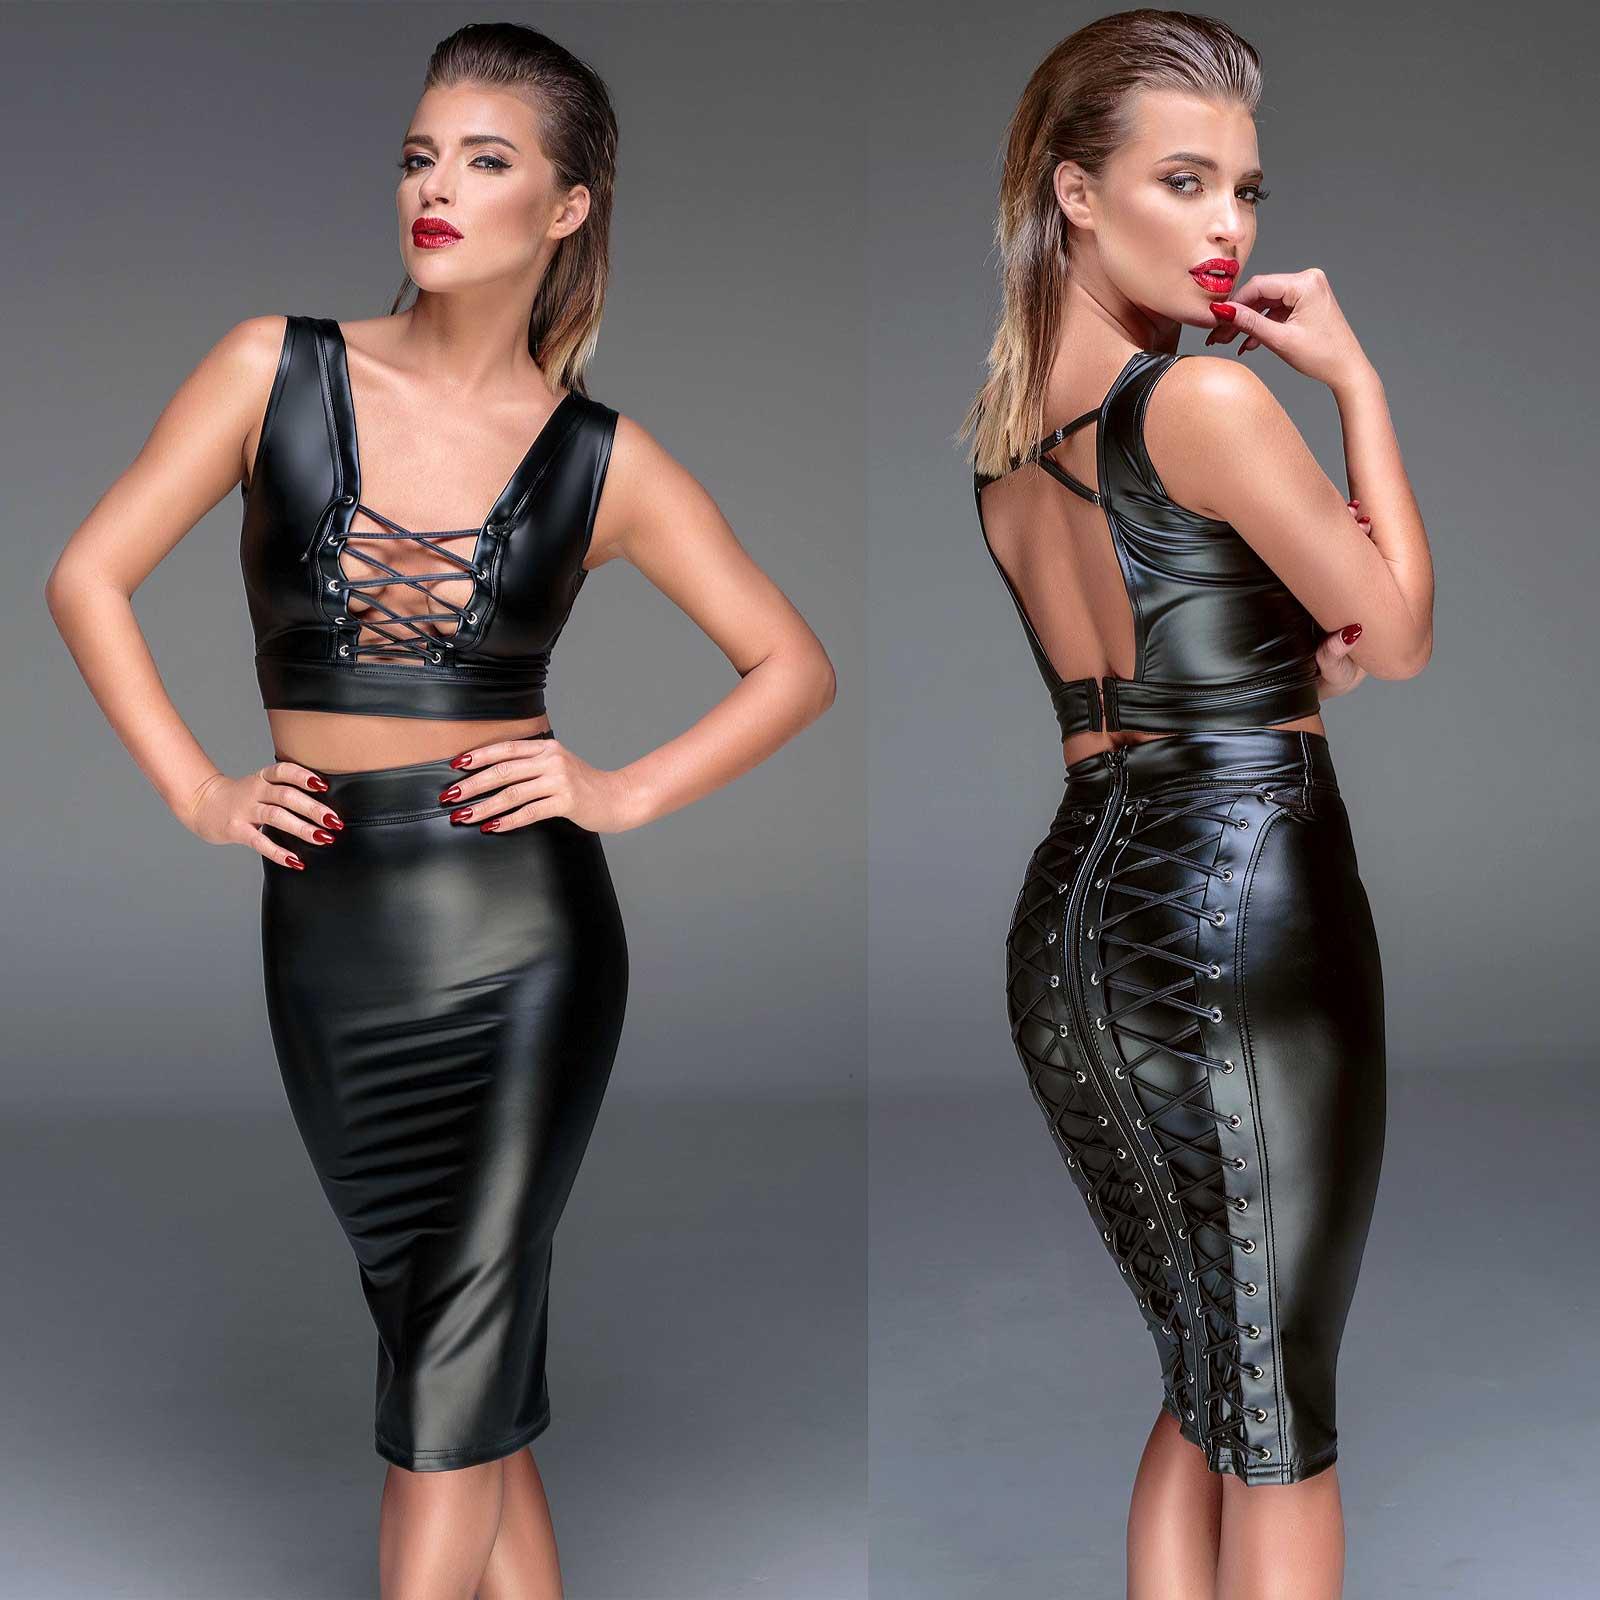 Skirts Noir Handmade Sophisticated Straps-rock Wetlook Pencil Skirt Gothic Clubwear